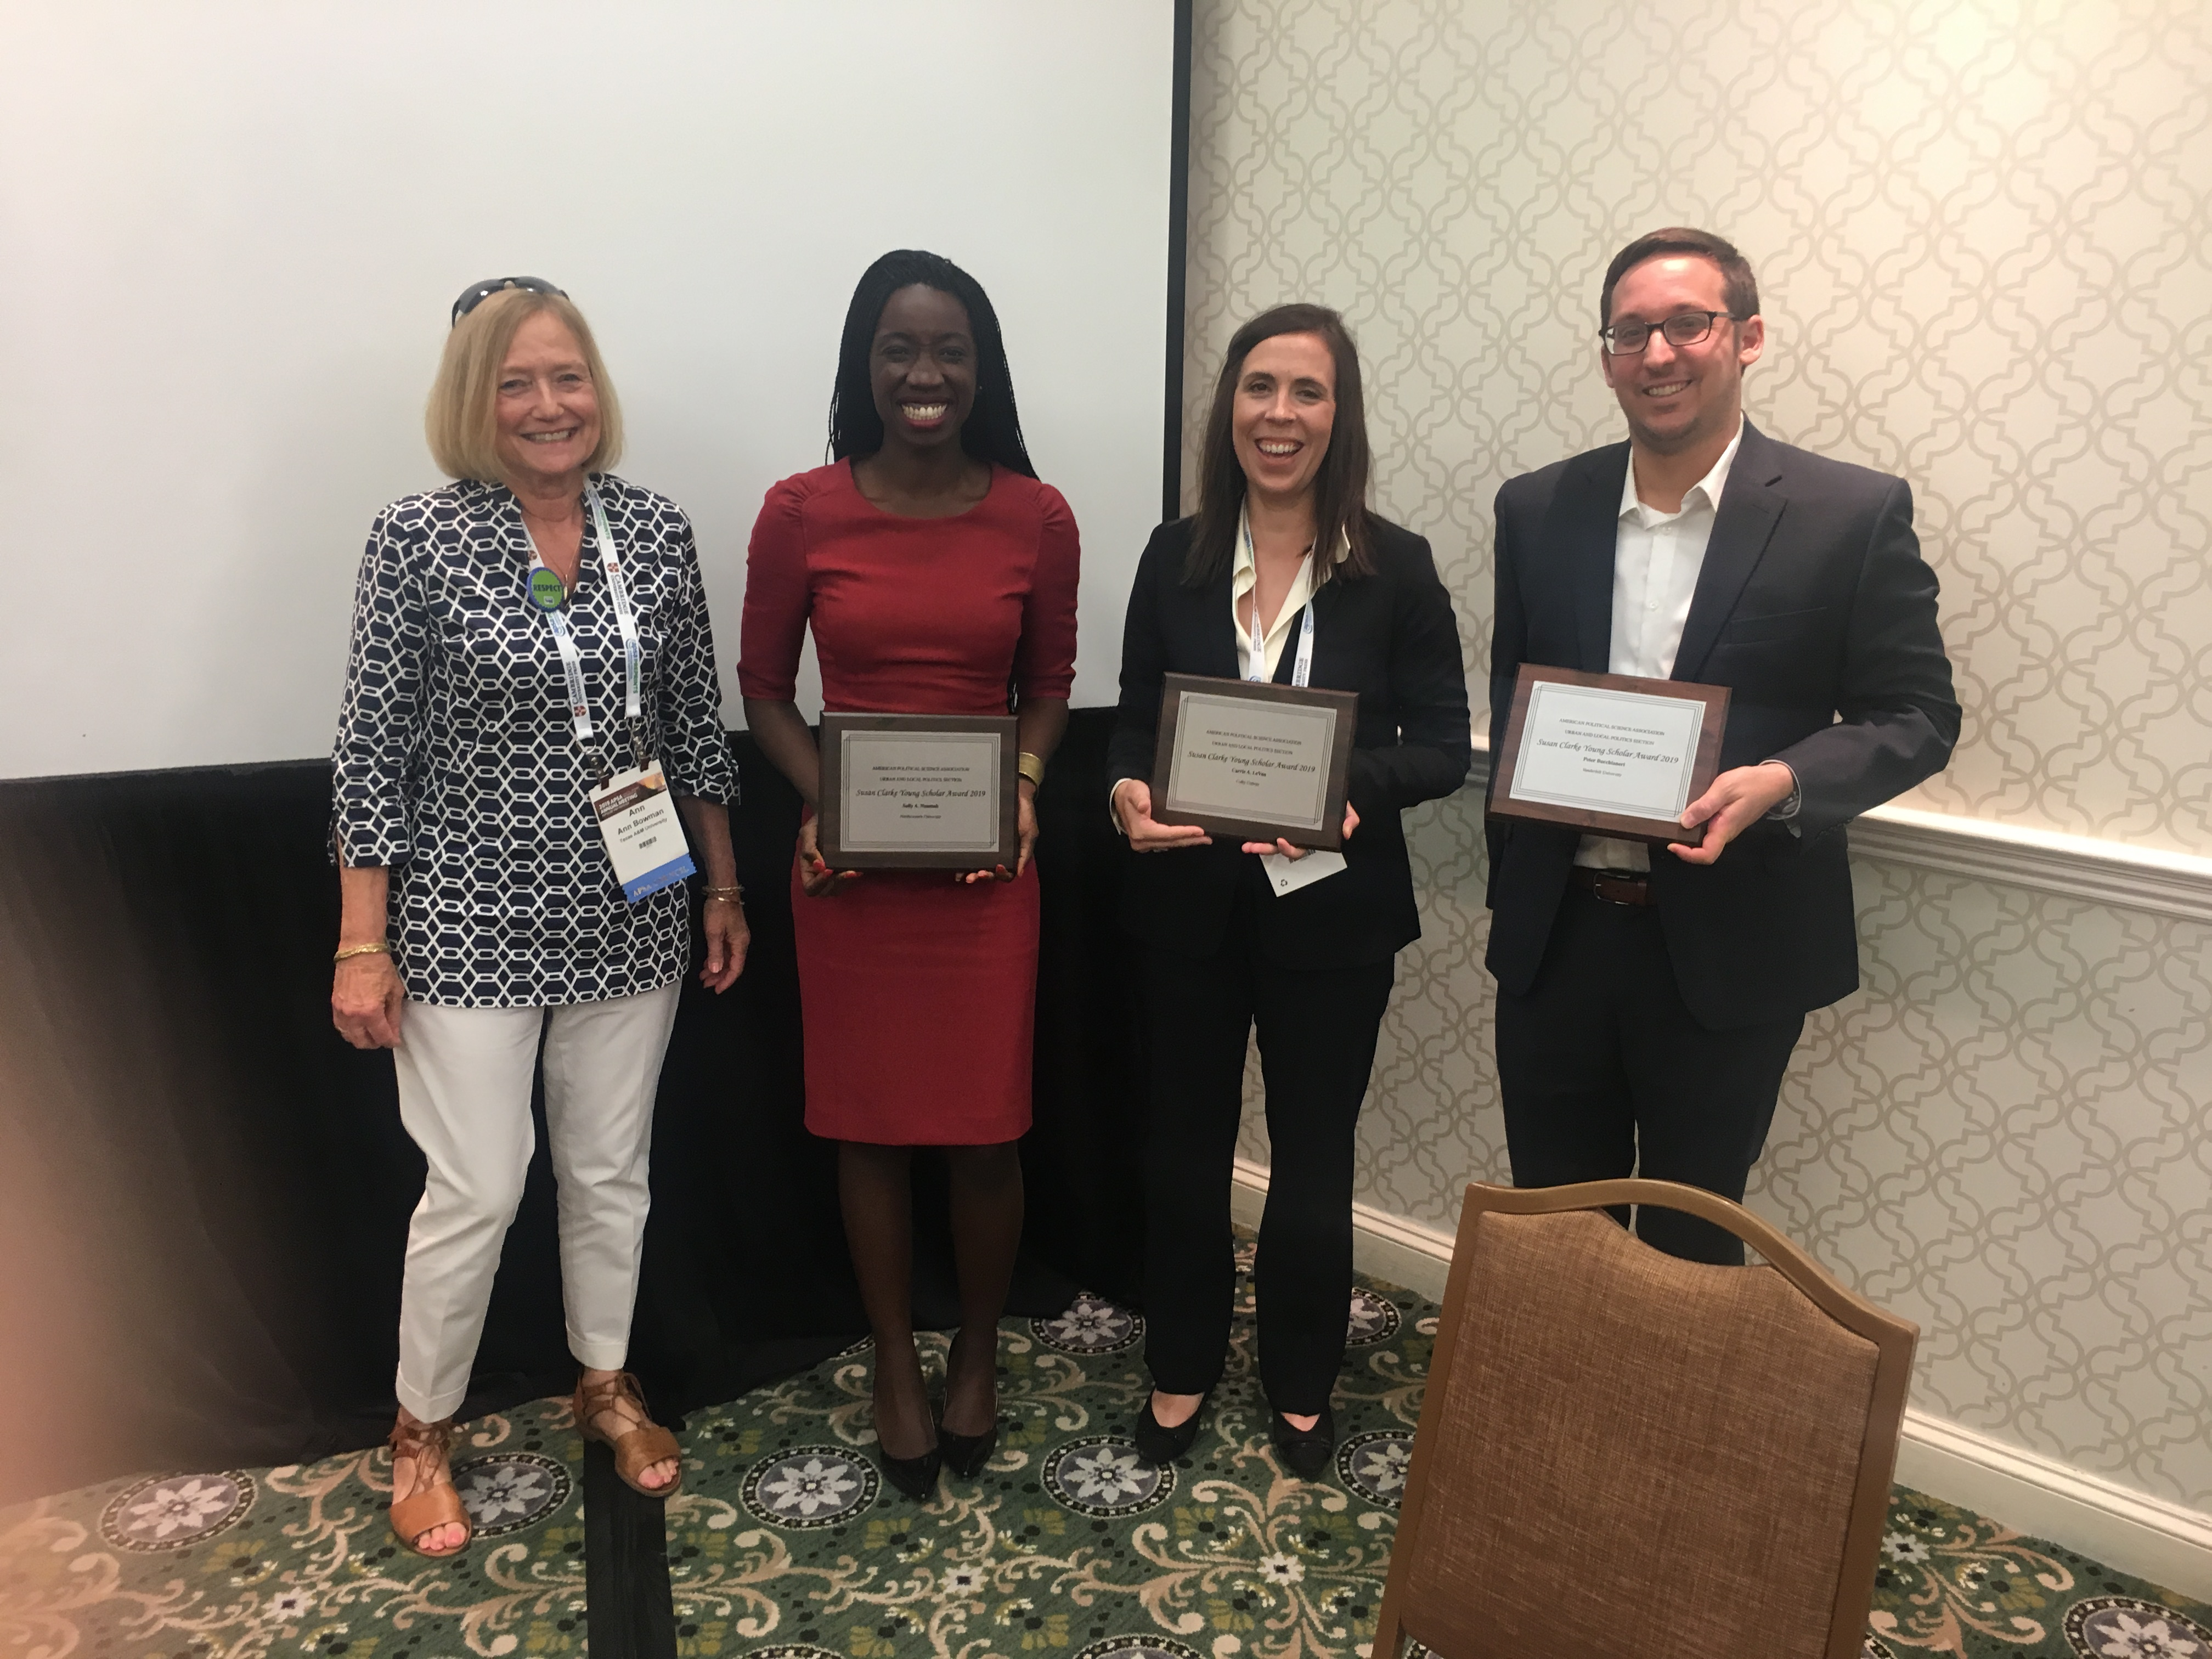 Ann Bowman presents the Susan Clarke Young Scholar Award to Peter Bucchianeri, Carrie A. LeVan, and Sally A. Nuamah